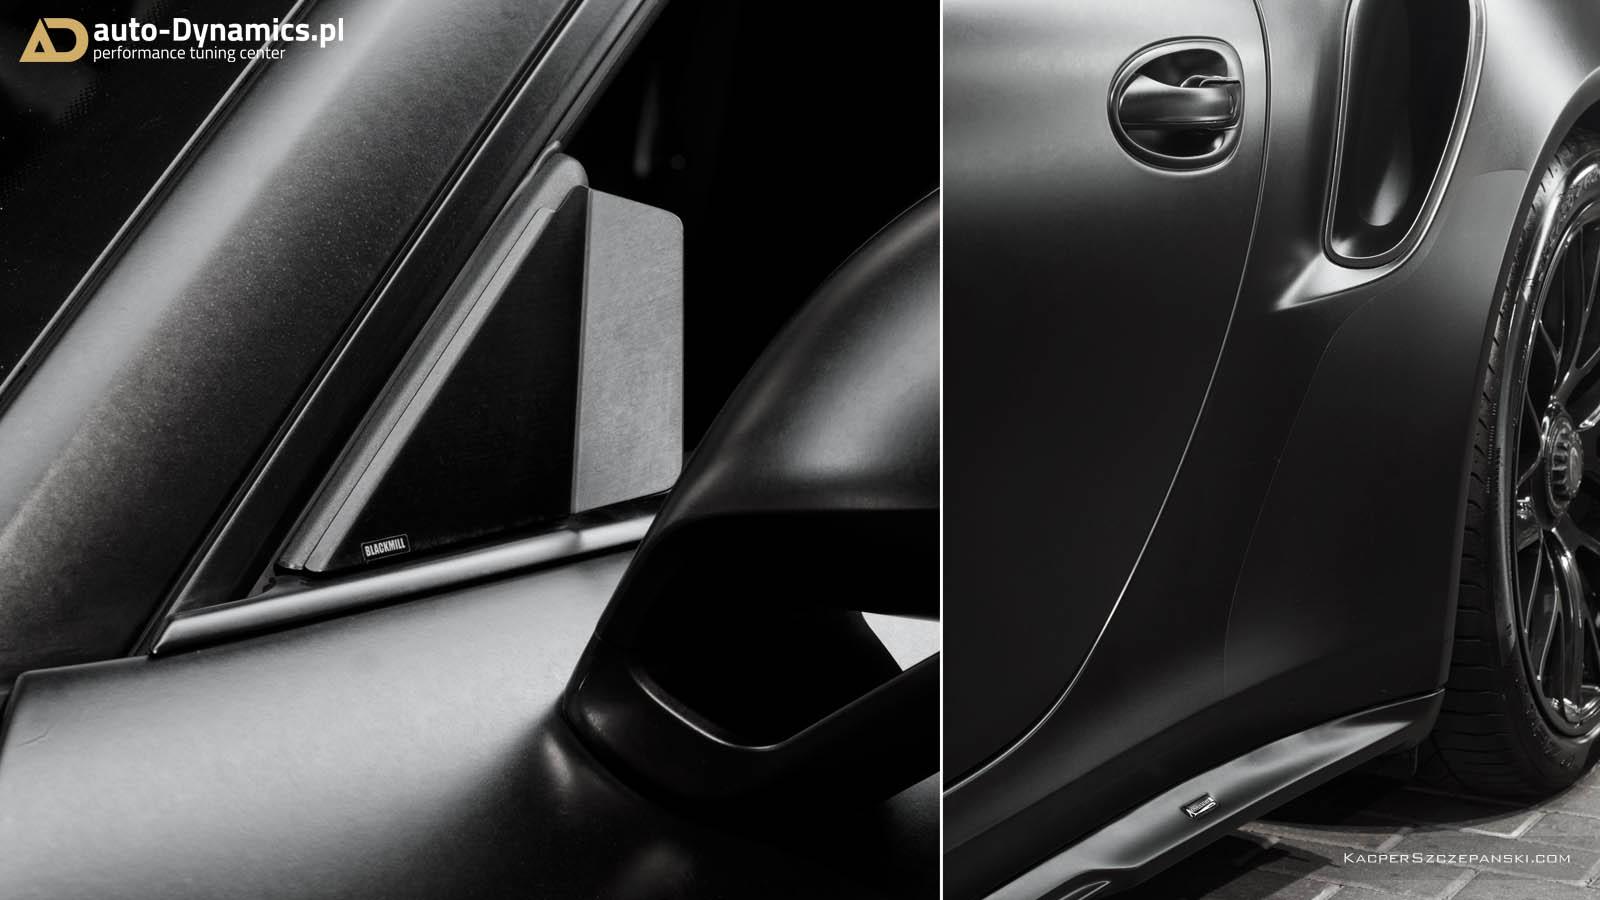 Porsche 911 Turbo S by Auto-Dynamics (6)